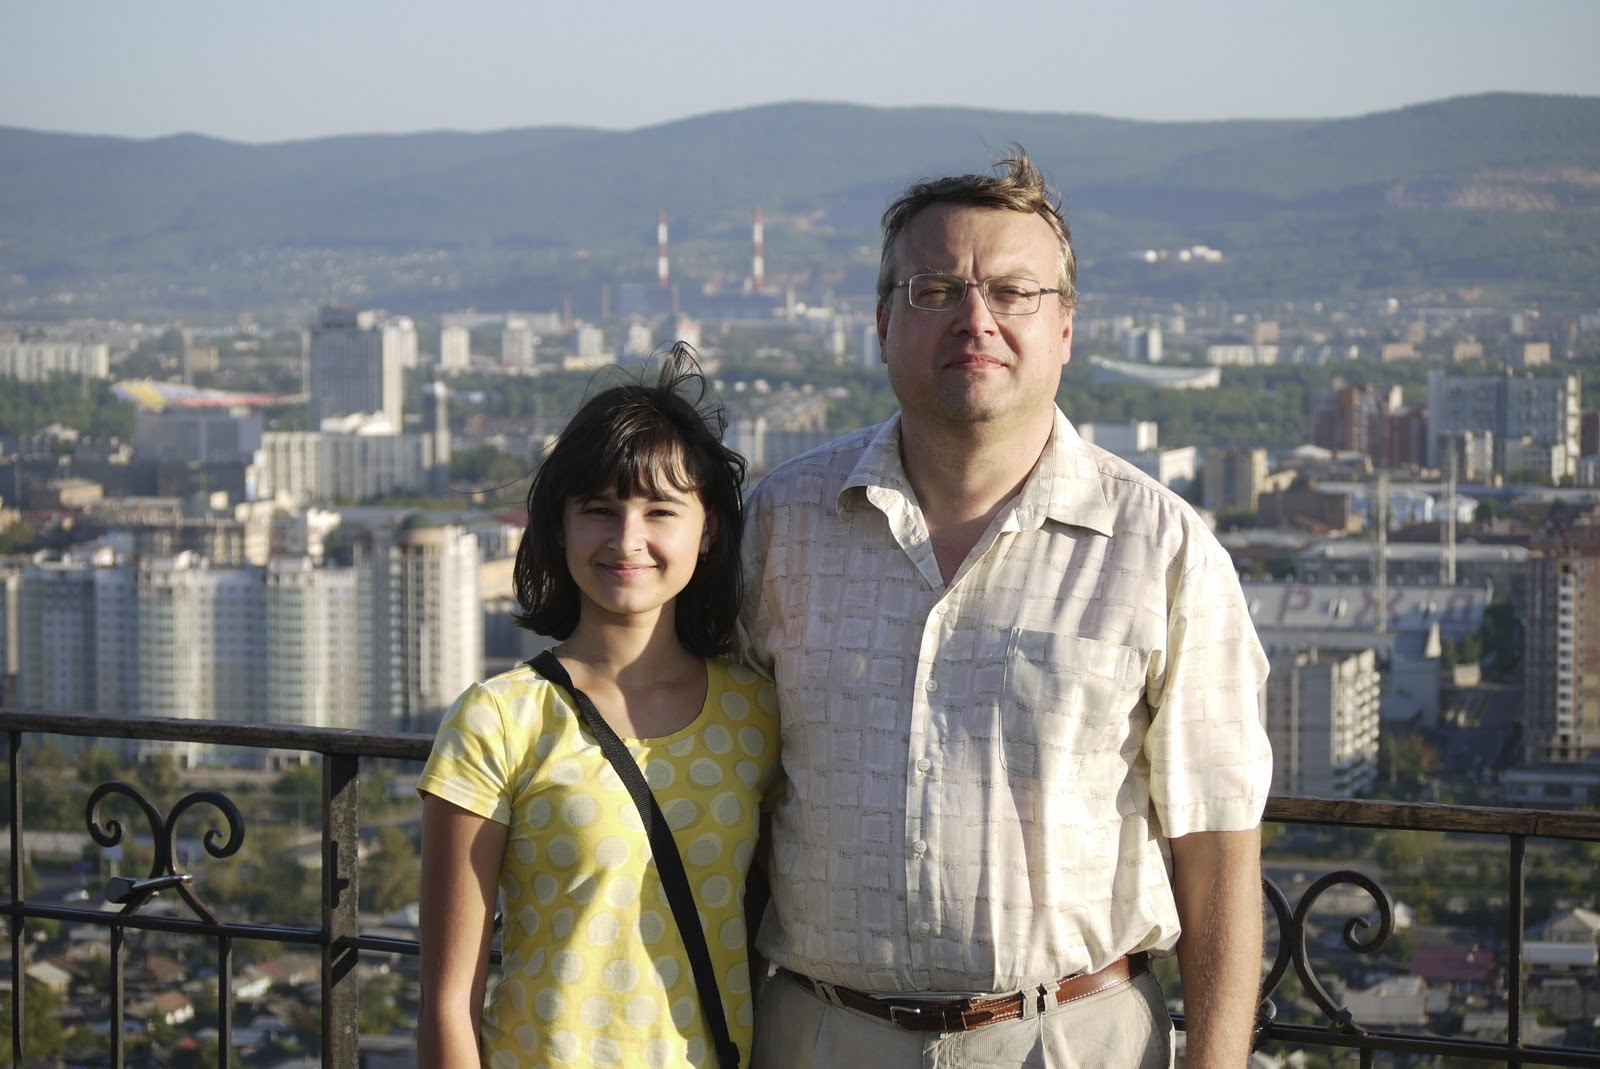 How to get to Krasnoyarsk 64